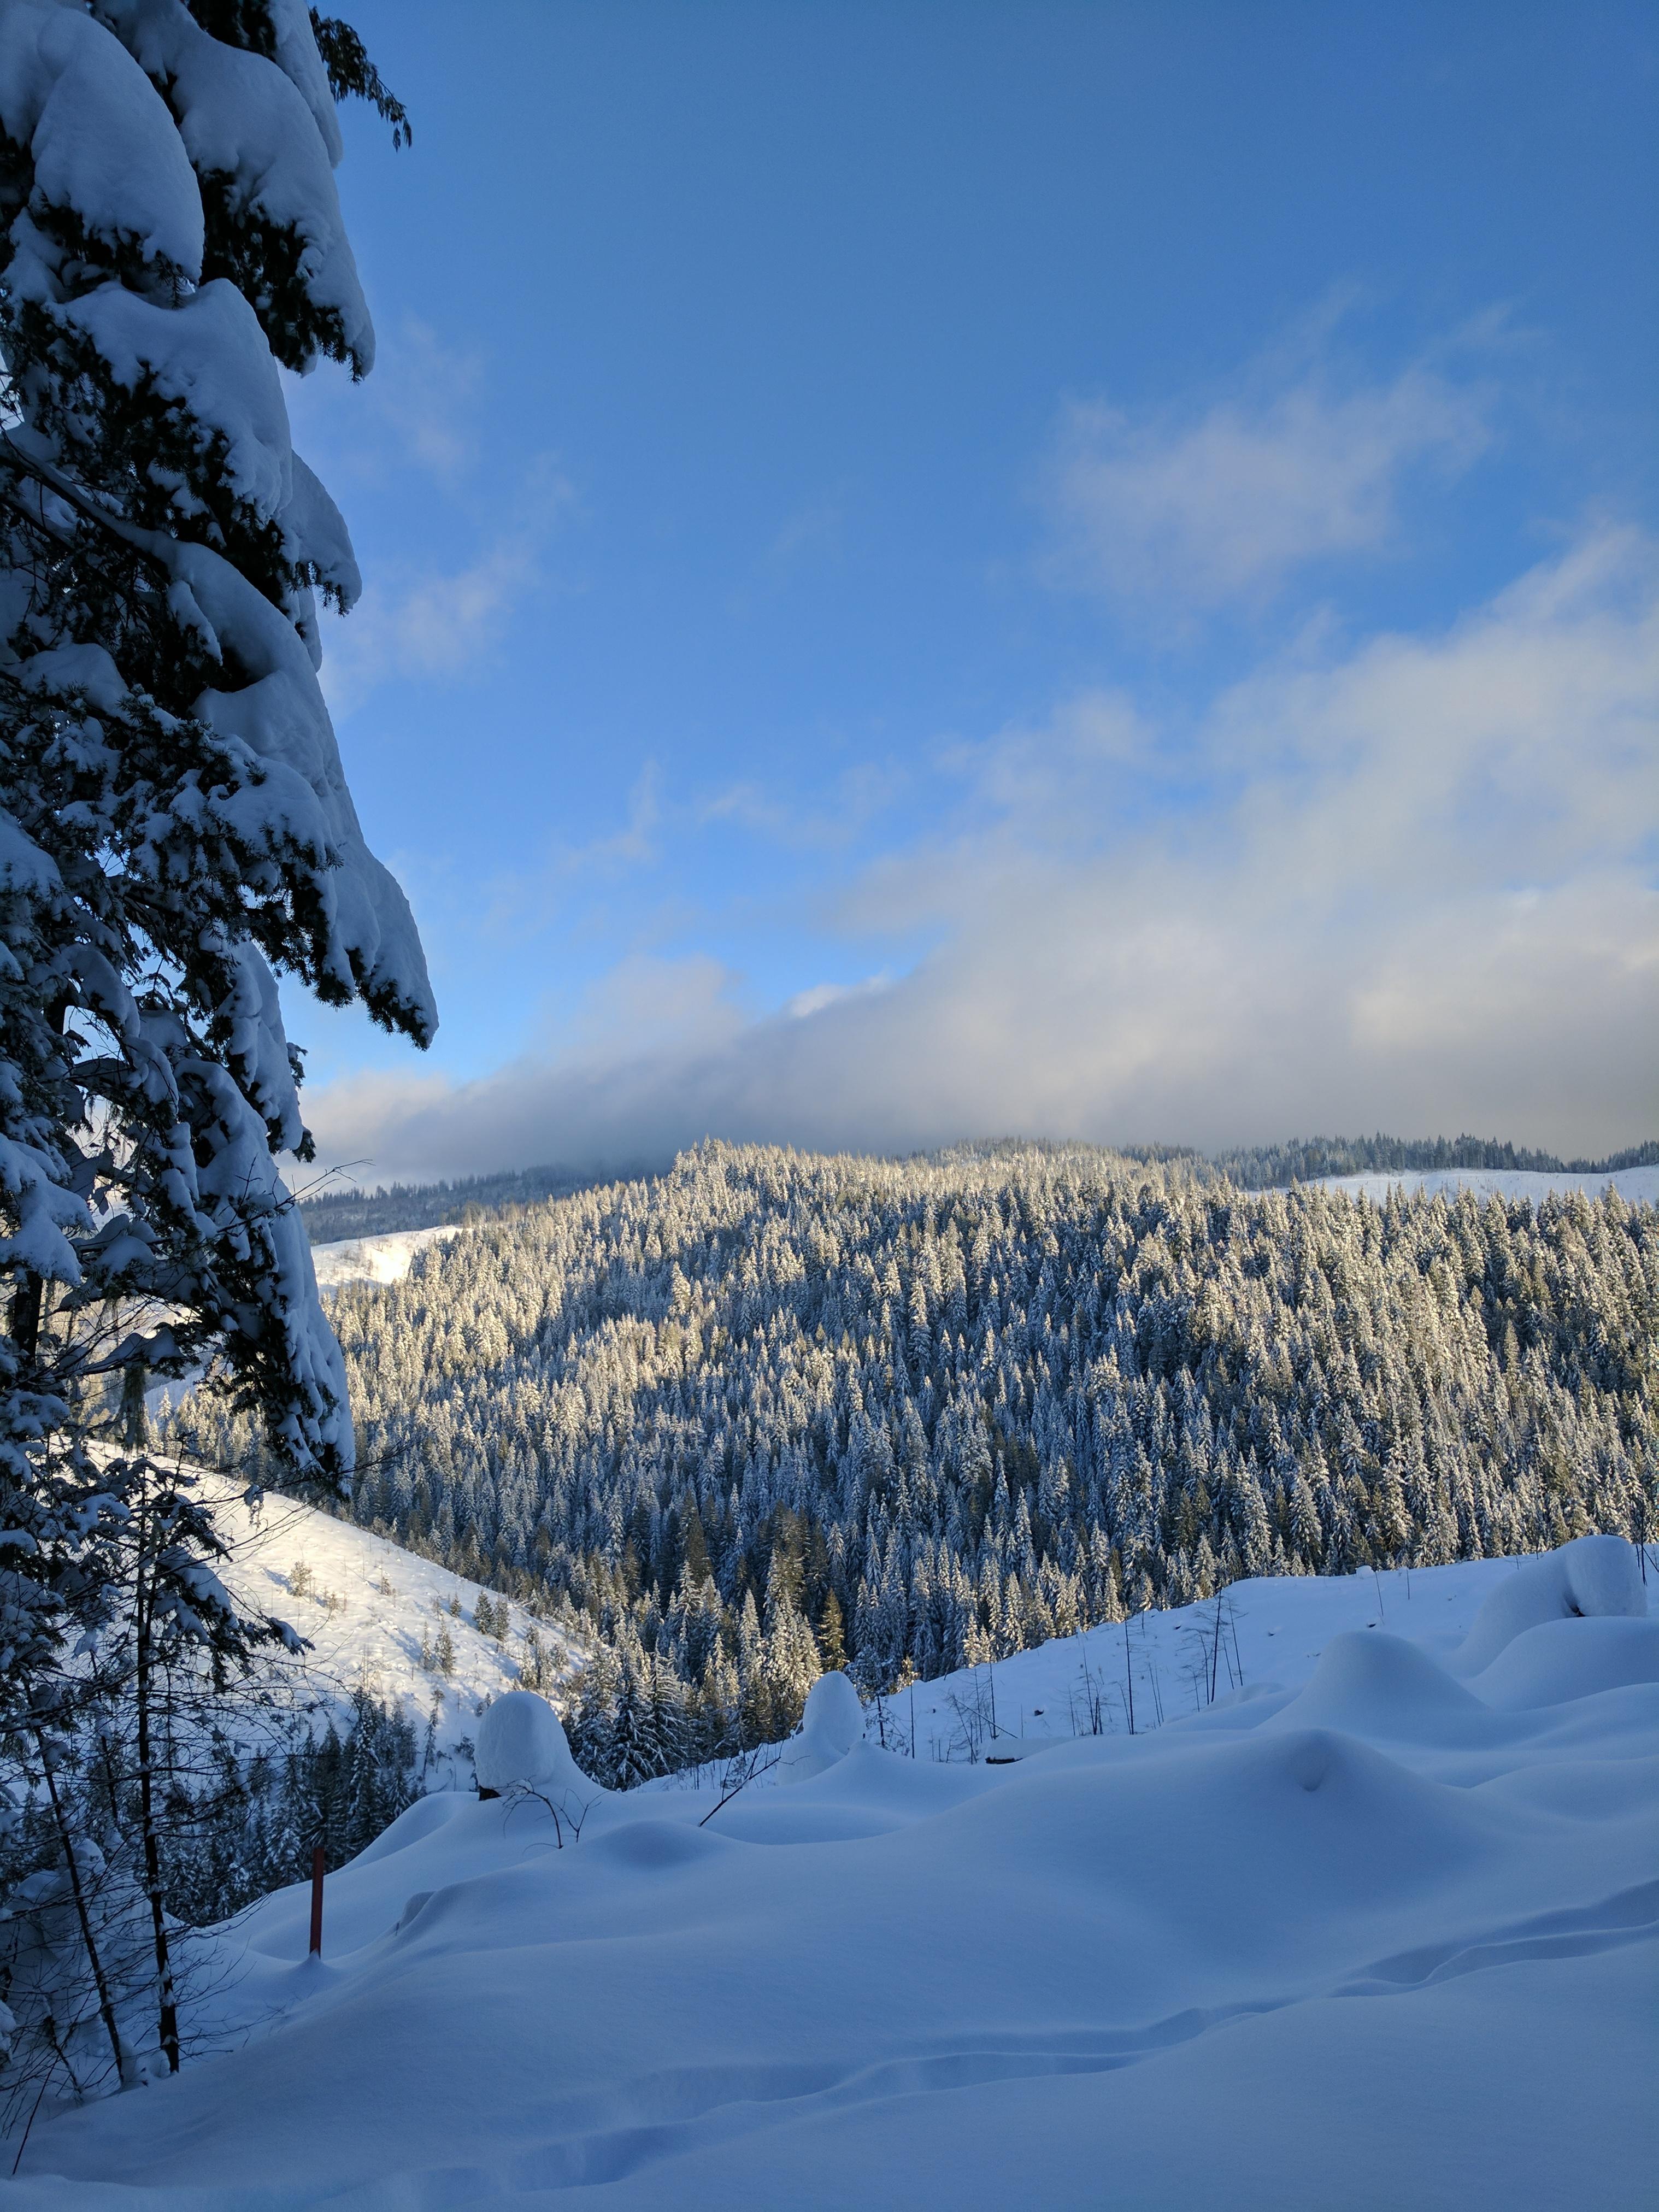 snowshoeing at the palouse divide nordic ski area  u2013 jeremy felt